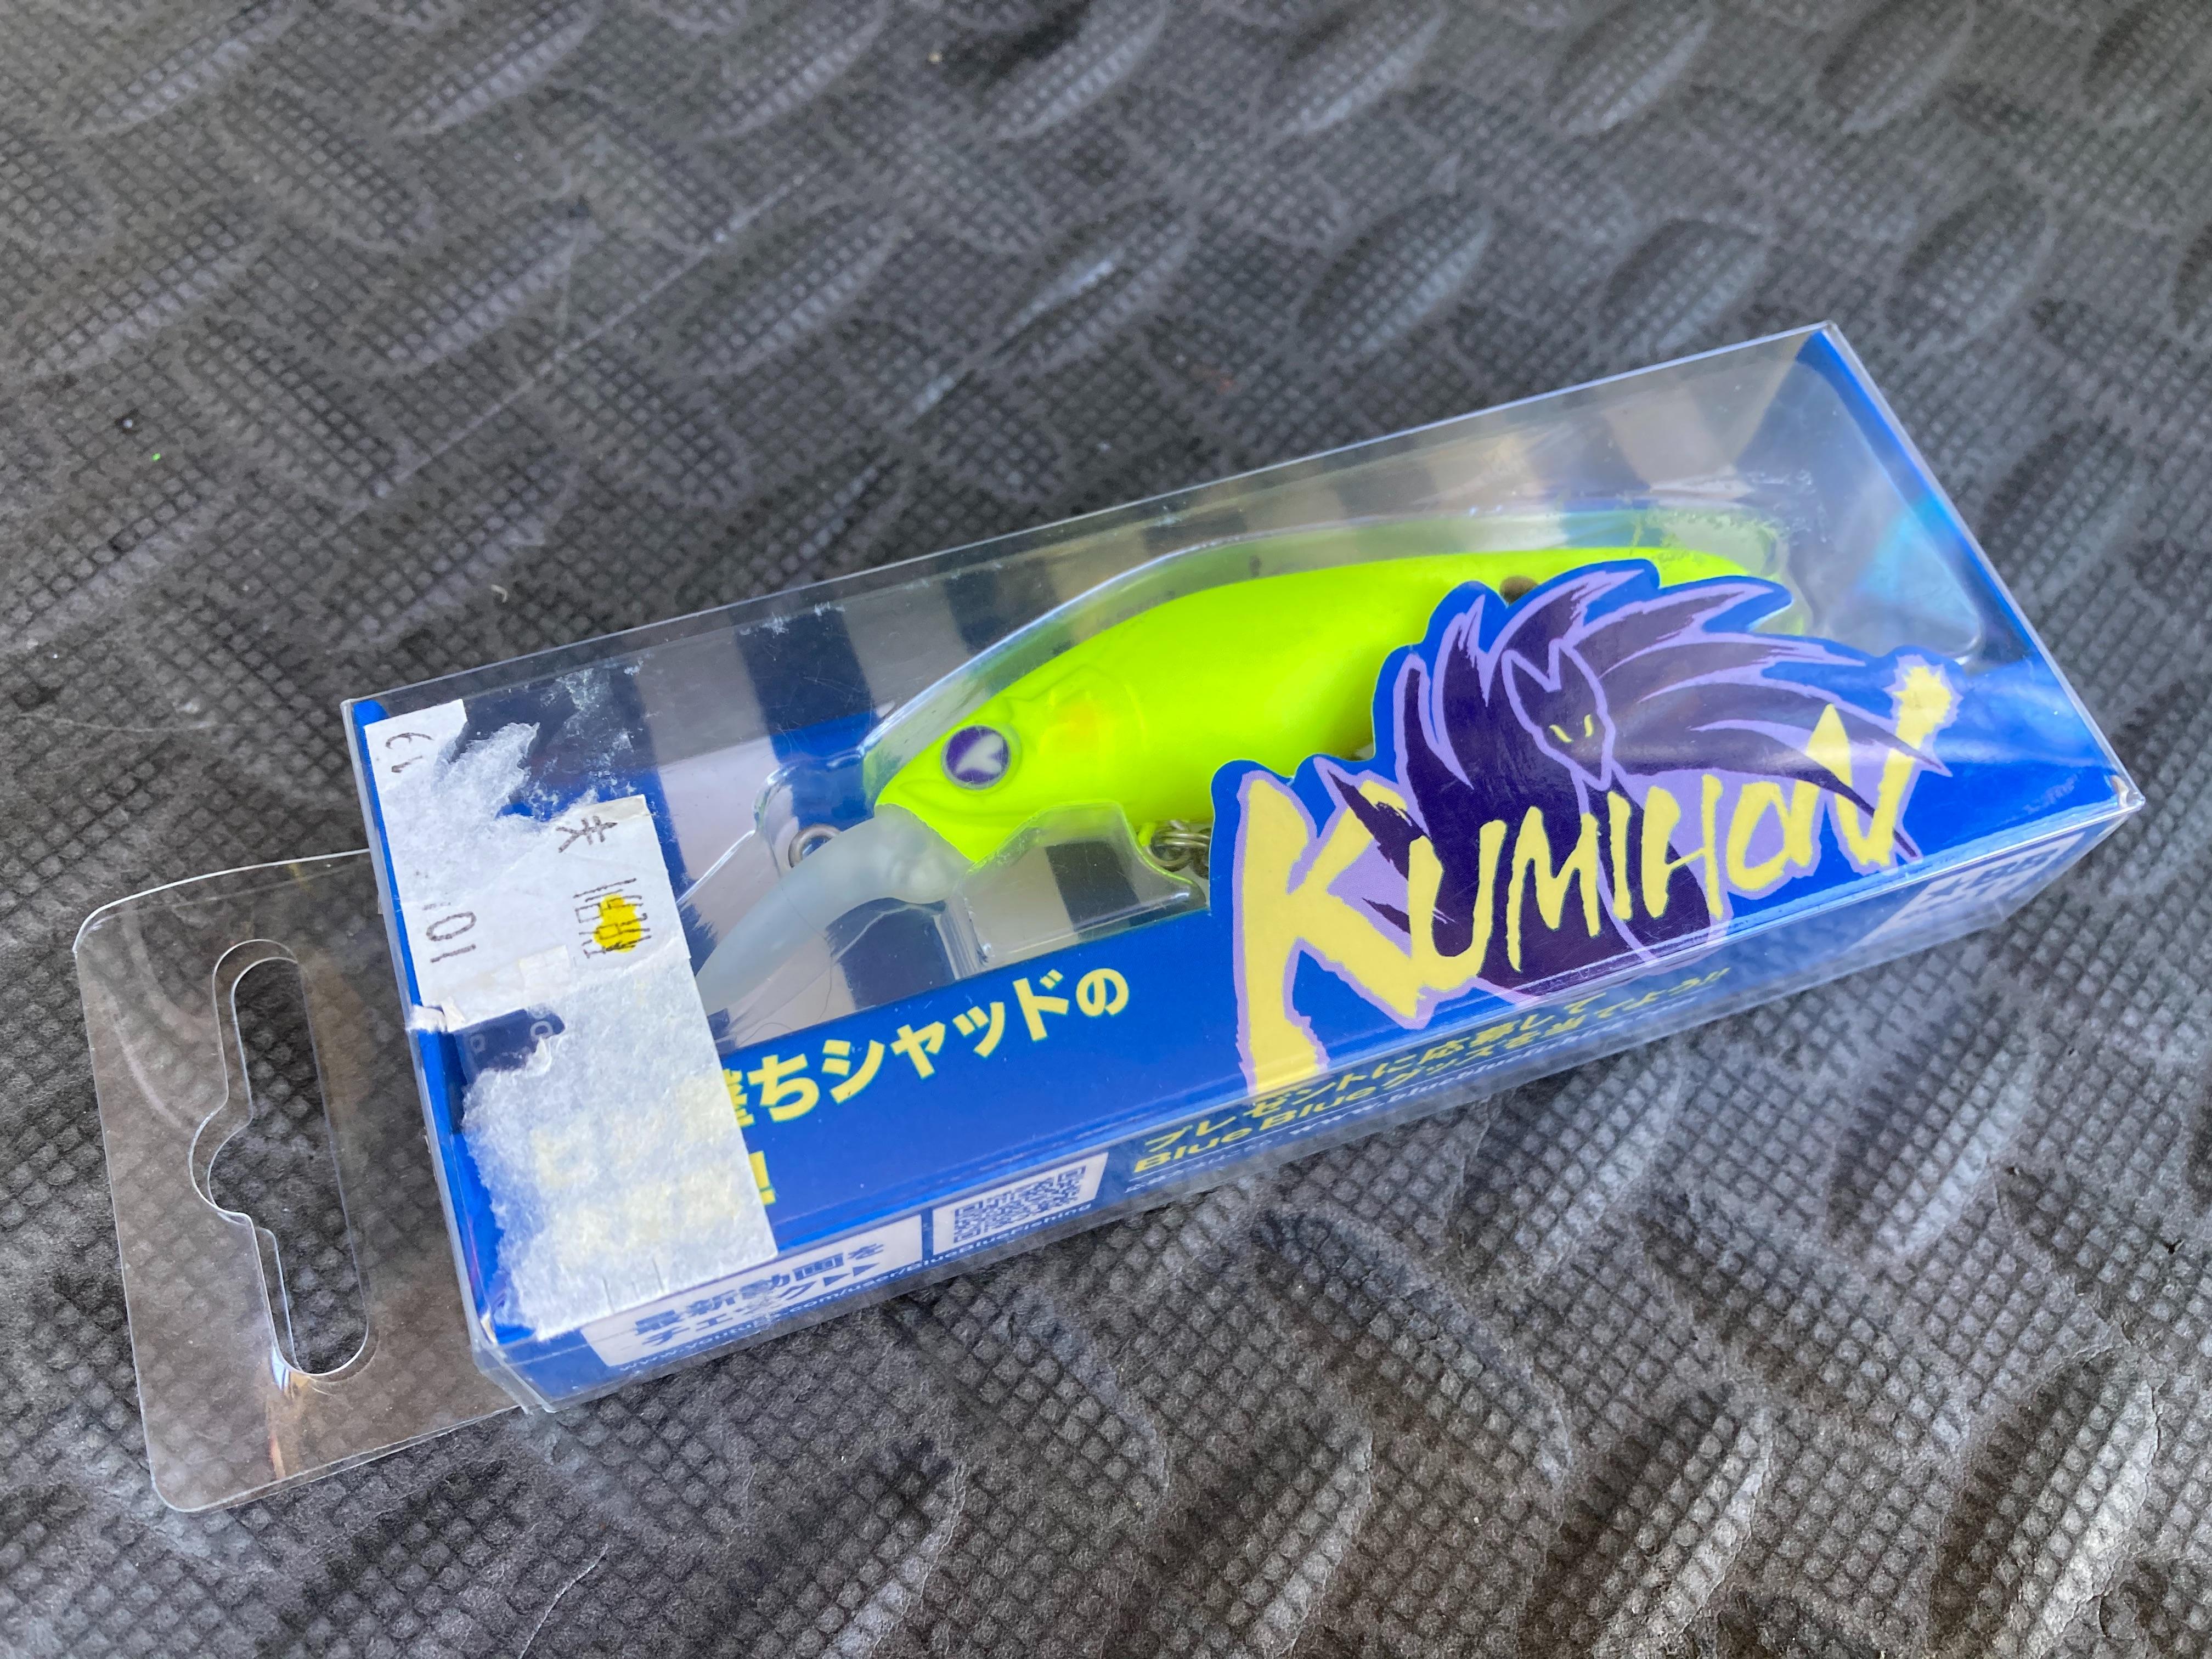 f:id:kuribox:20201021074915j:image